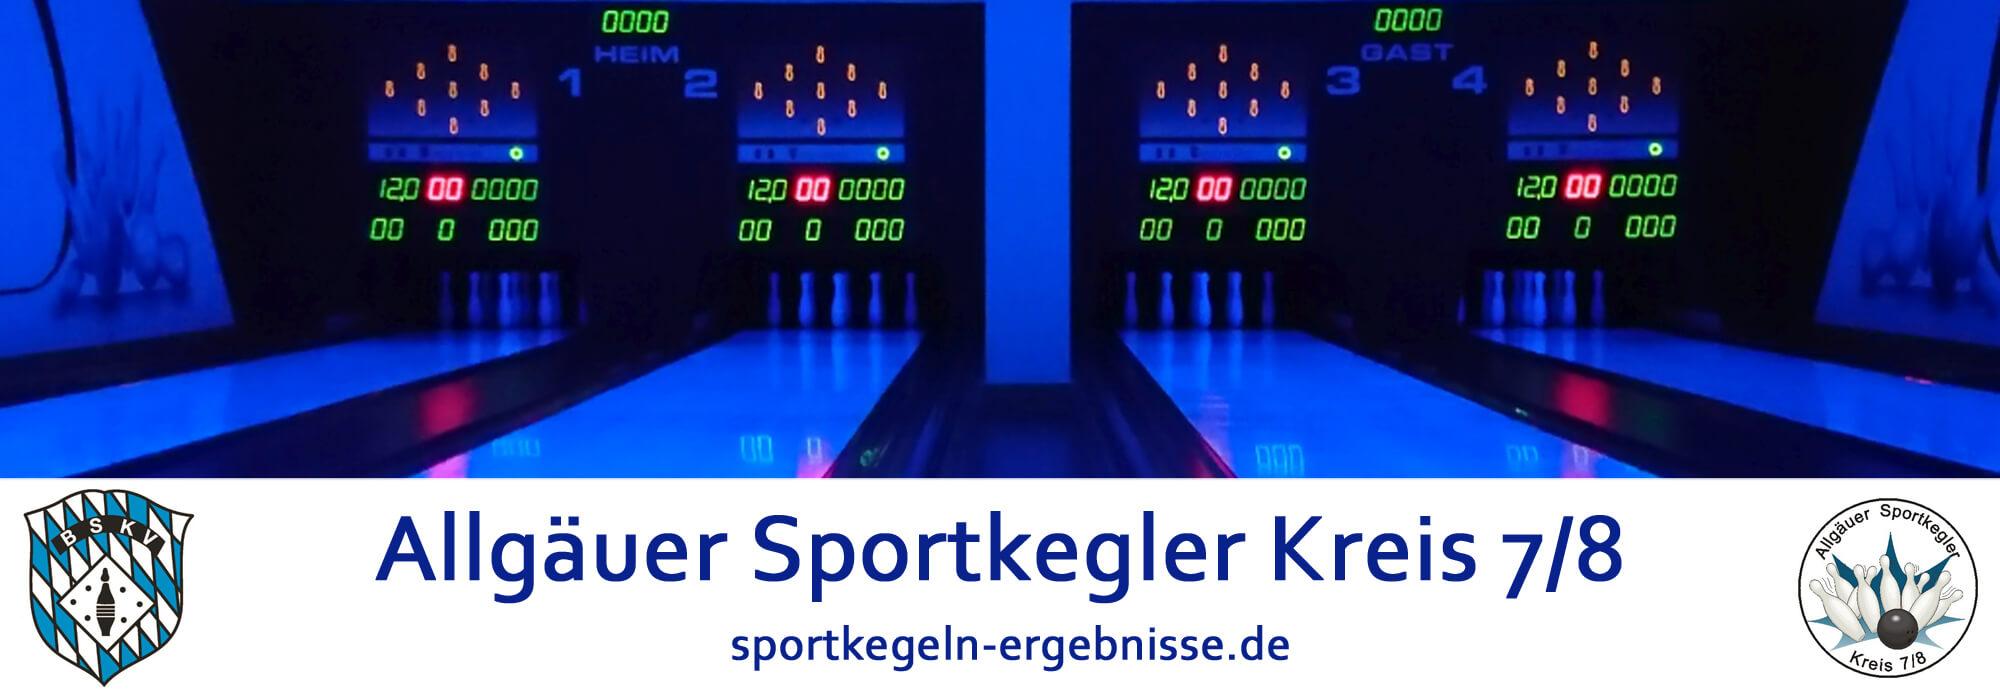 Allgäuer Sportkegler Kreis 7/8